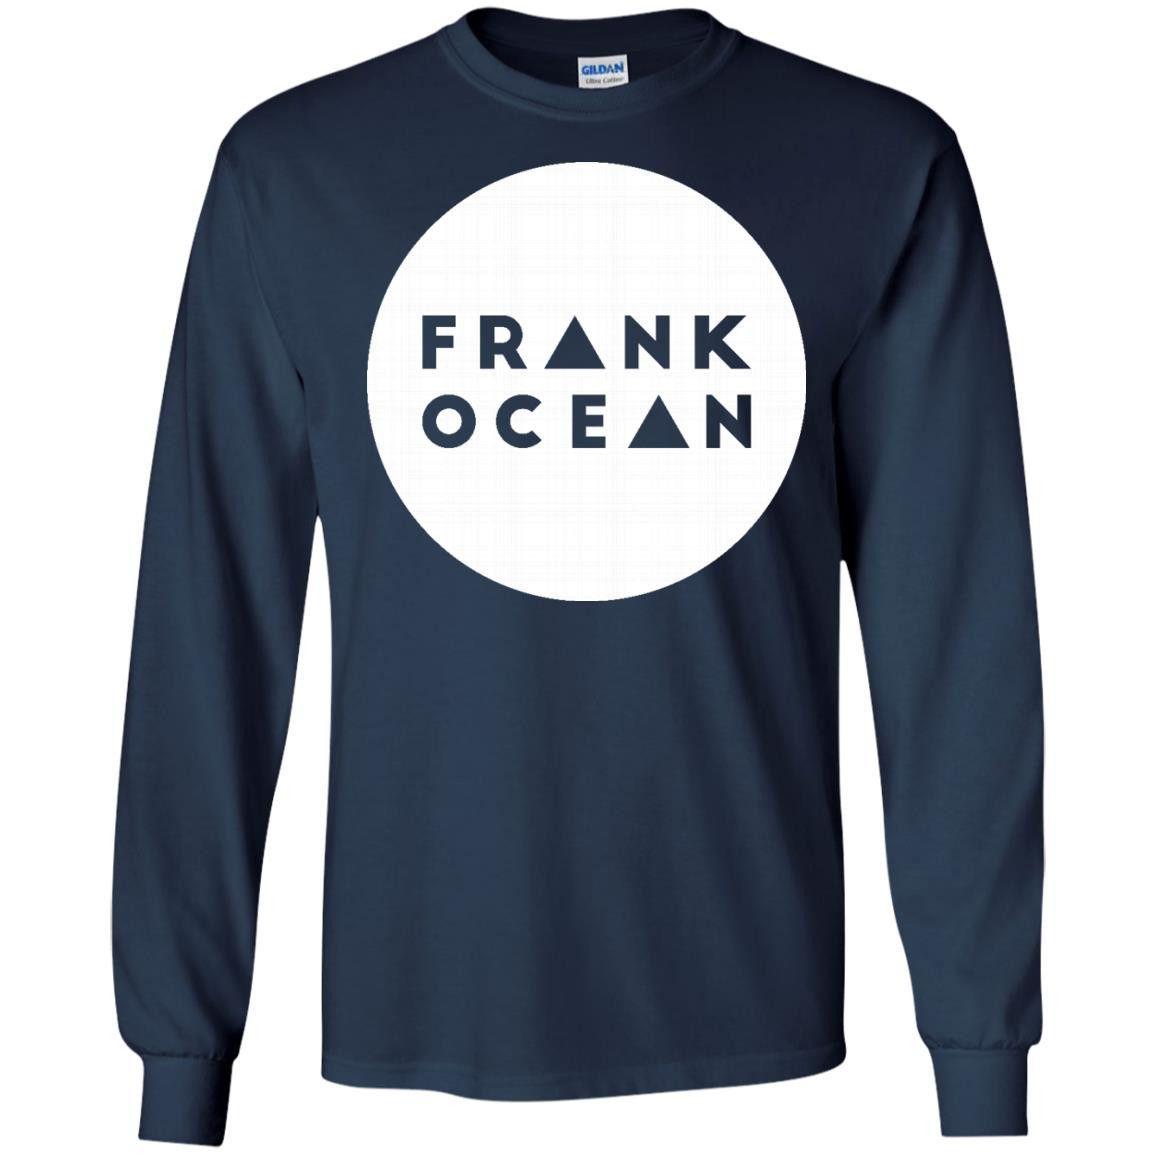 F Ocean T Shirt - funny frank boys ocean don t cry t shirt -01 G240 Gildan LS Ultra Cotton T-Shirt